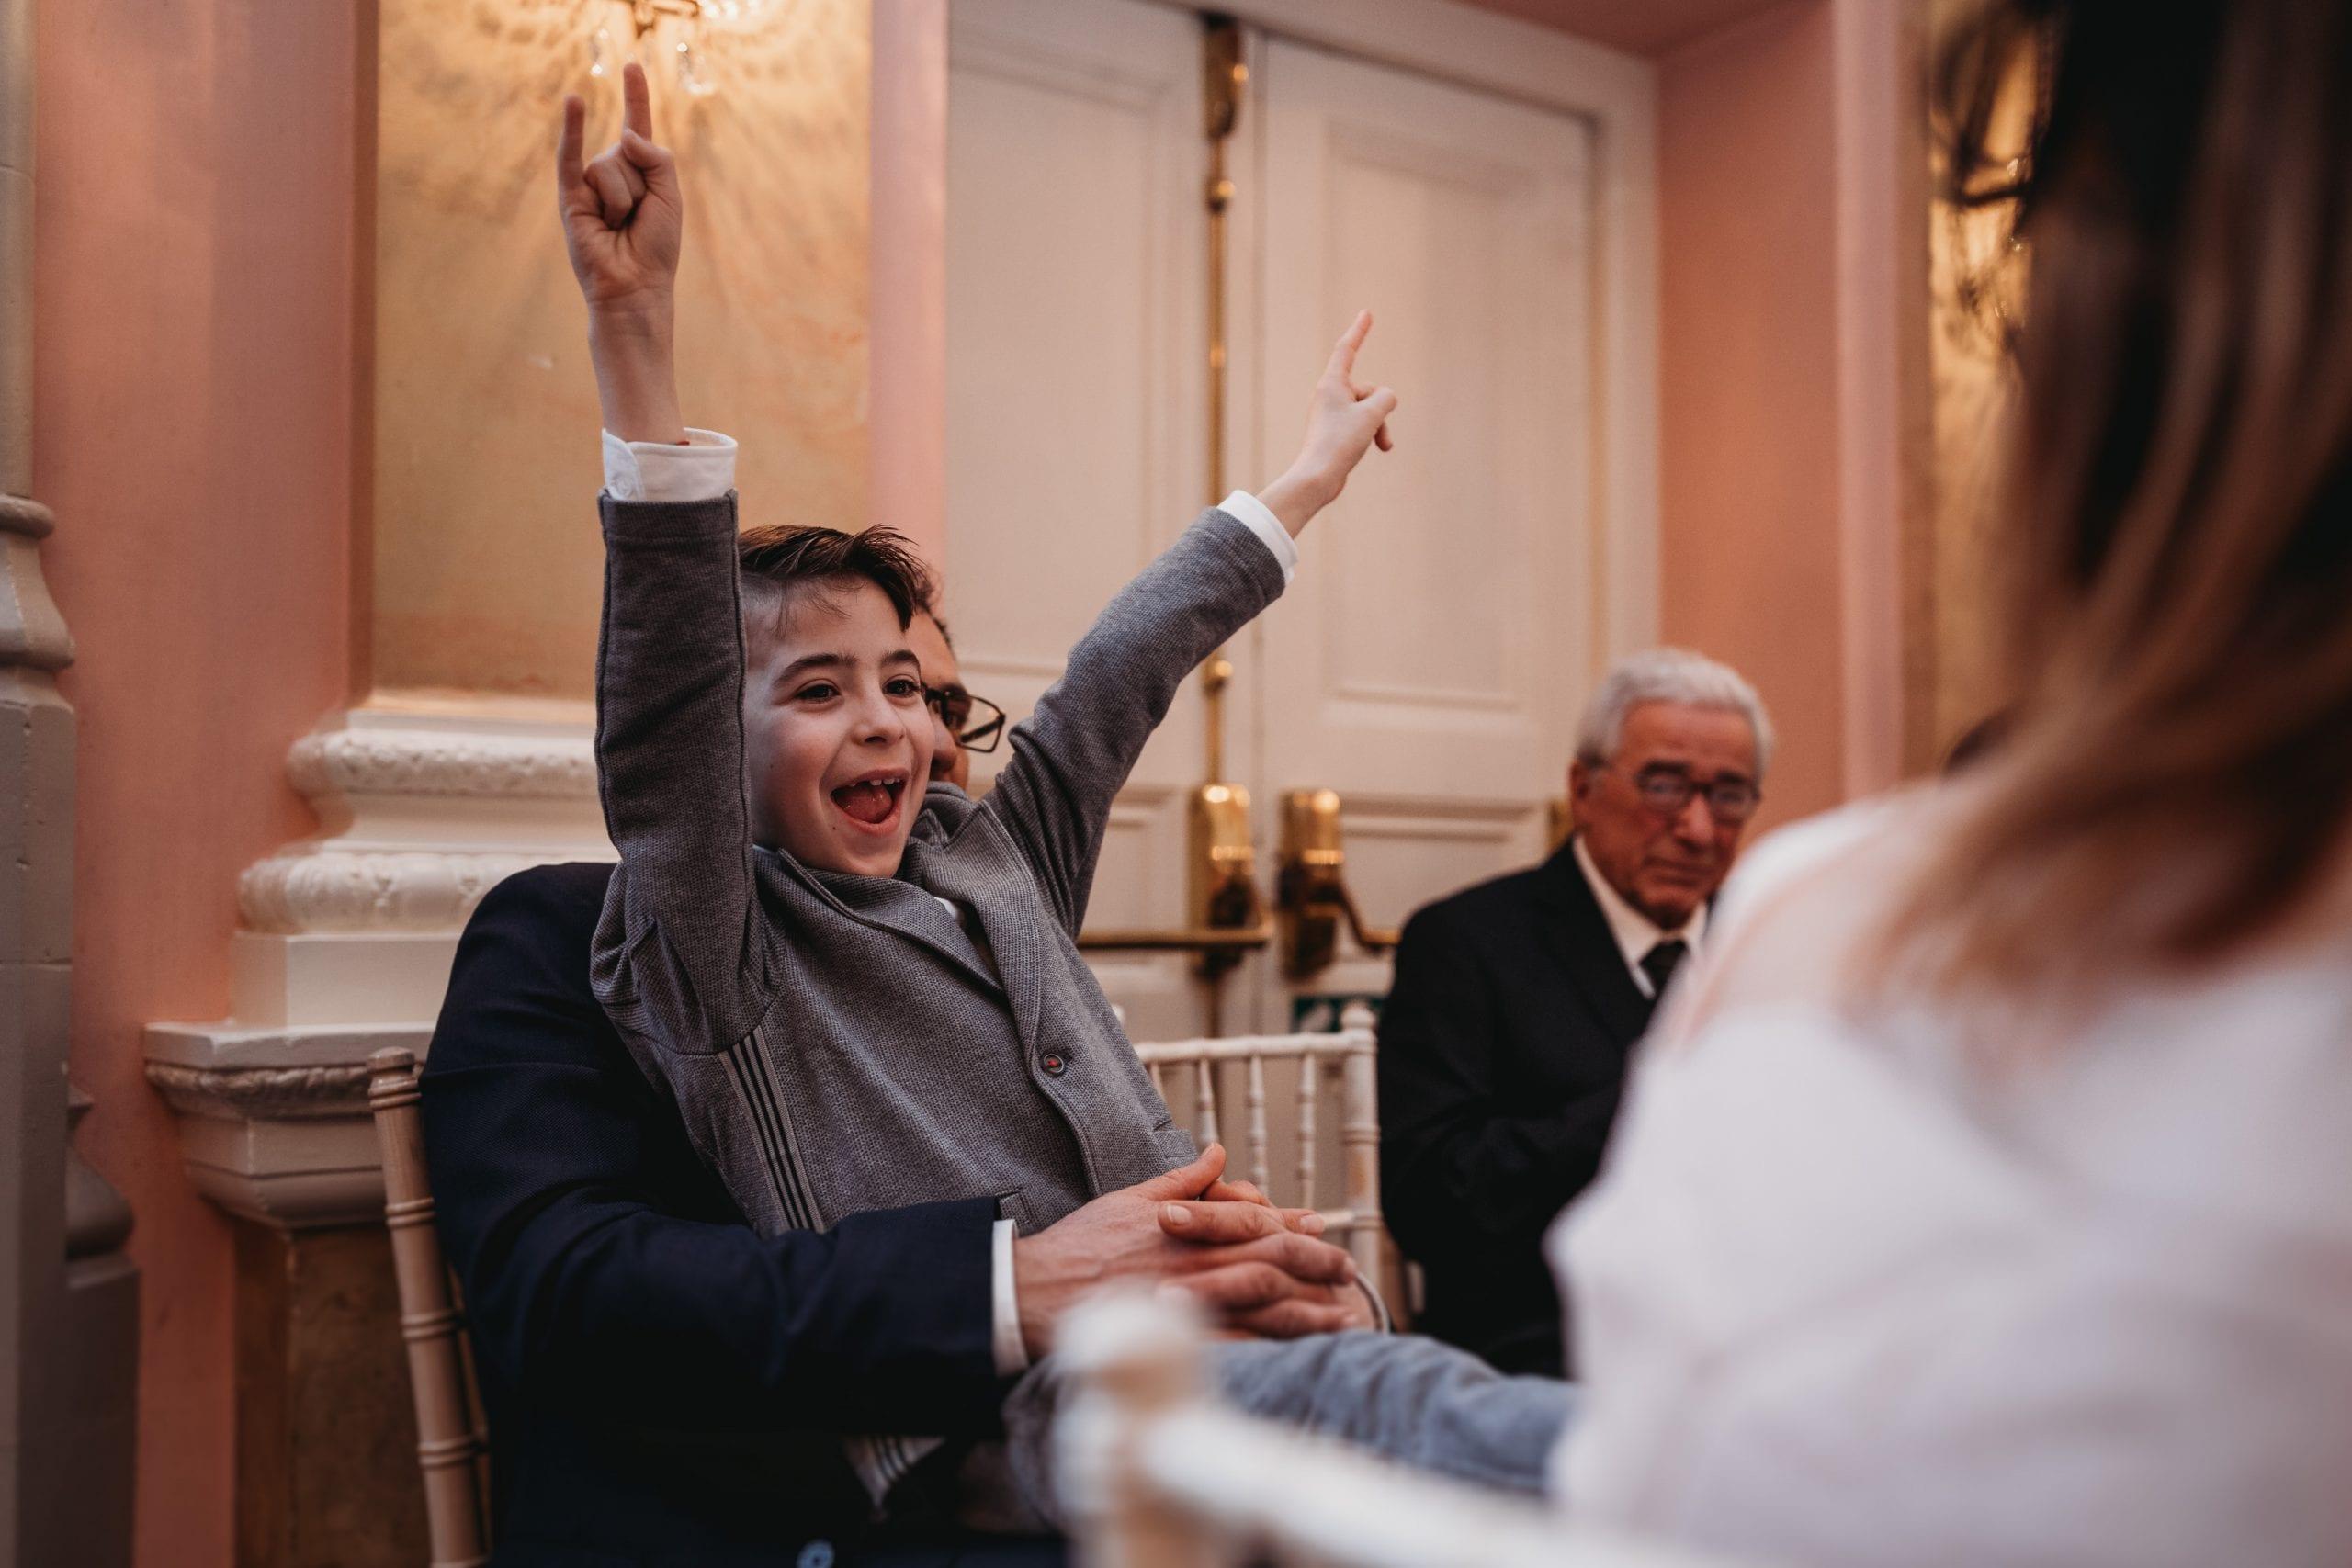 boy cheering at a Danesfield House wedding